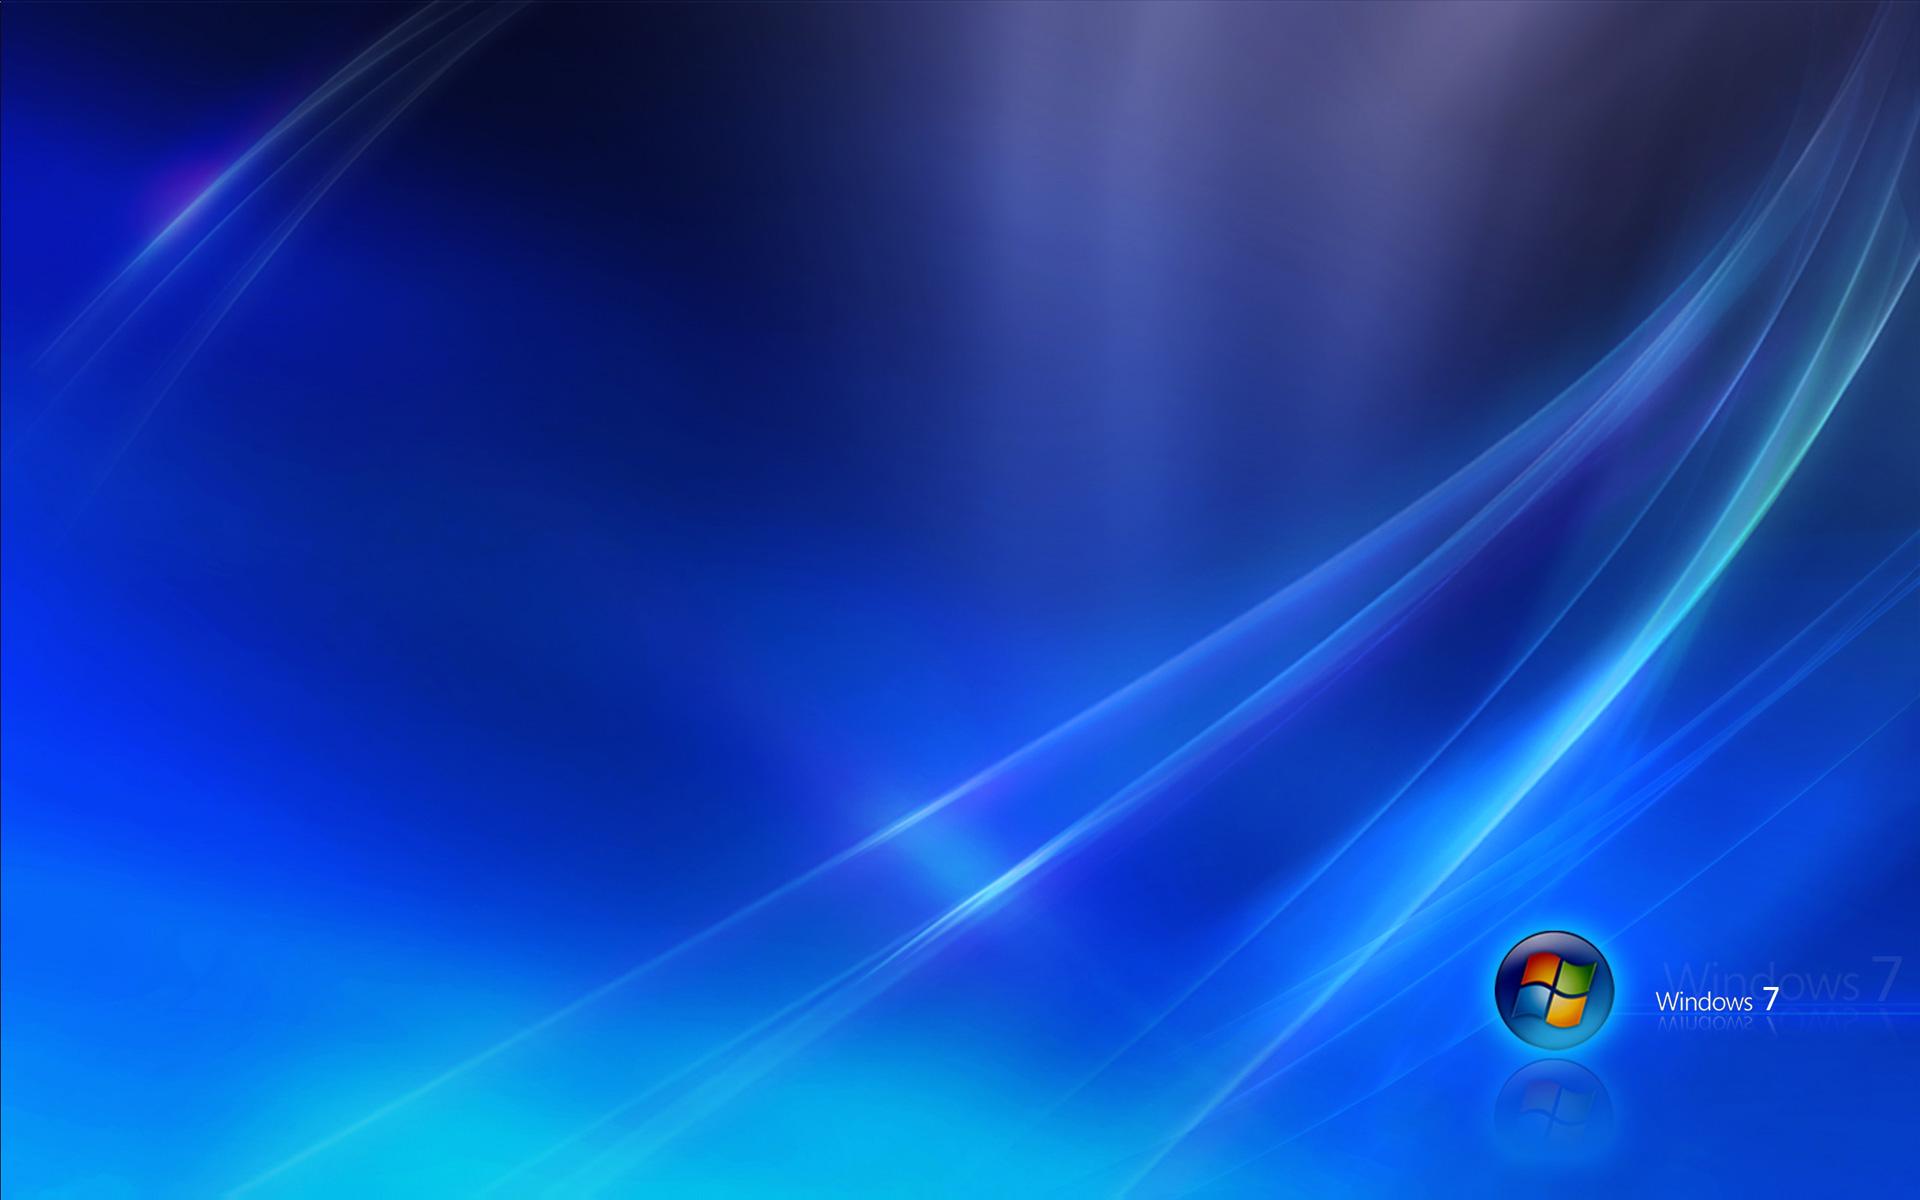 backgrounds for windows 7 wallpaper desktop windows 7 background 1920x1200